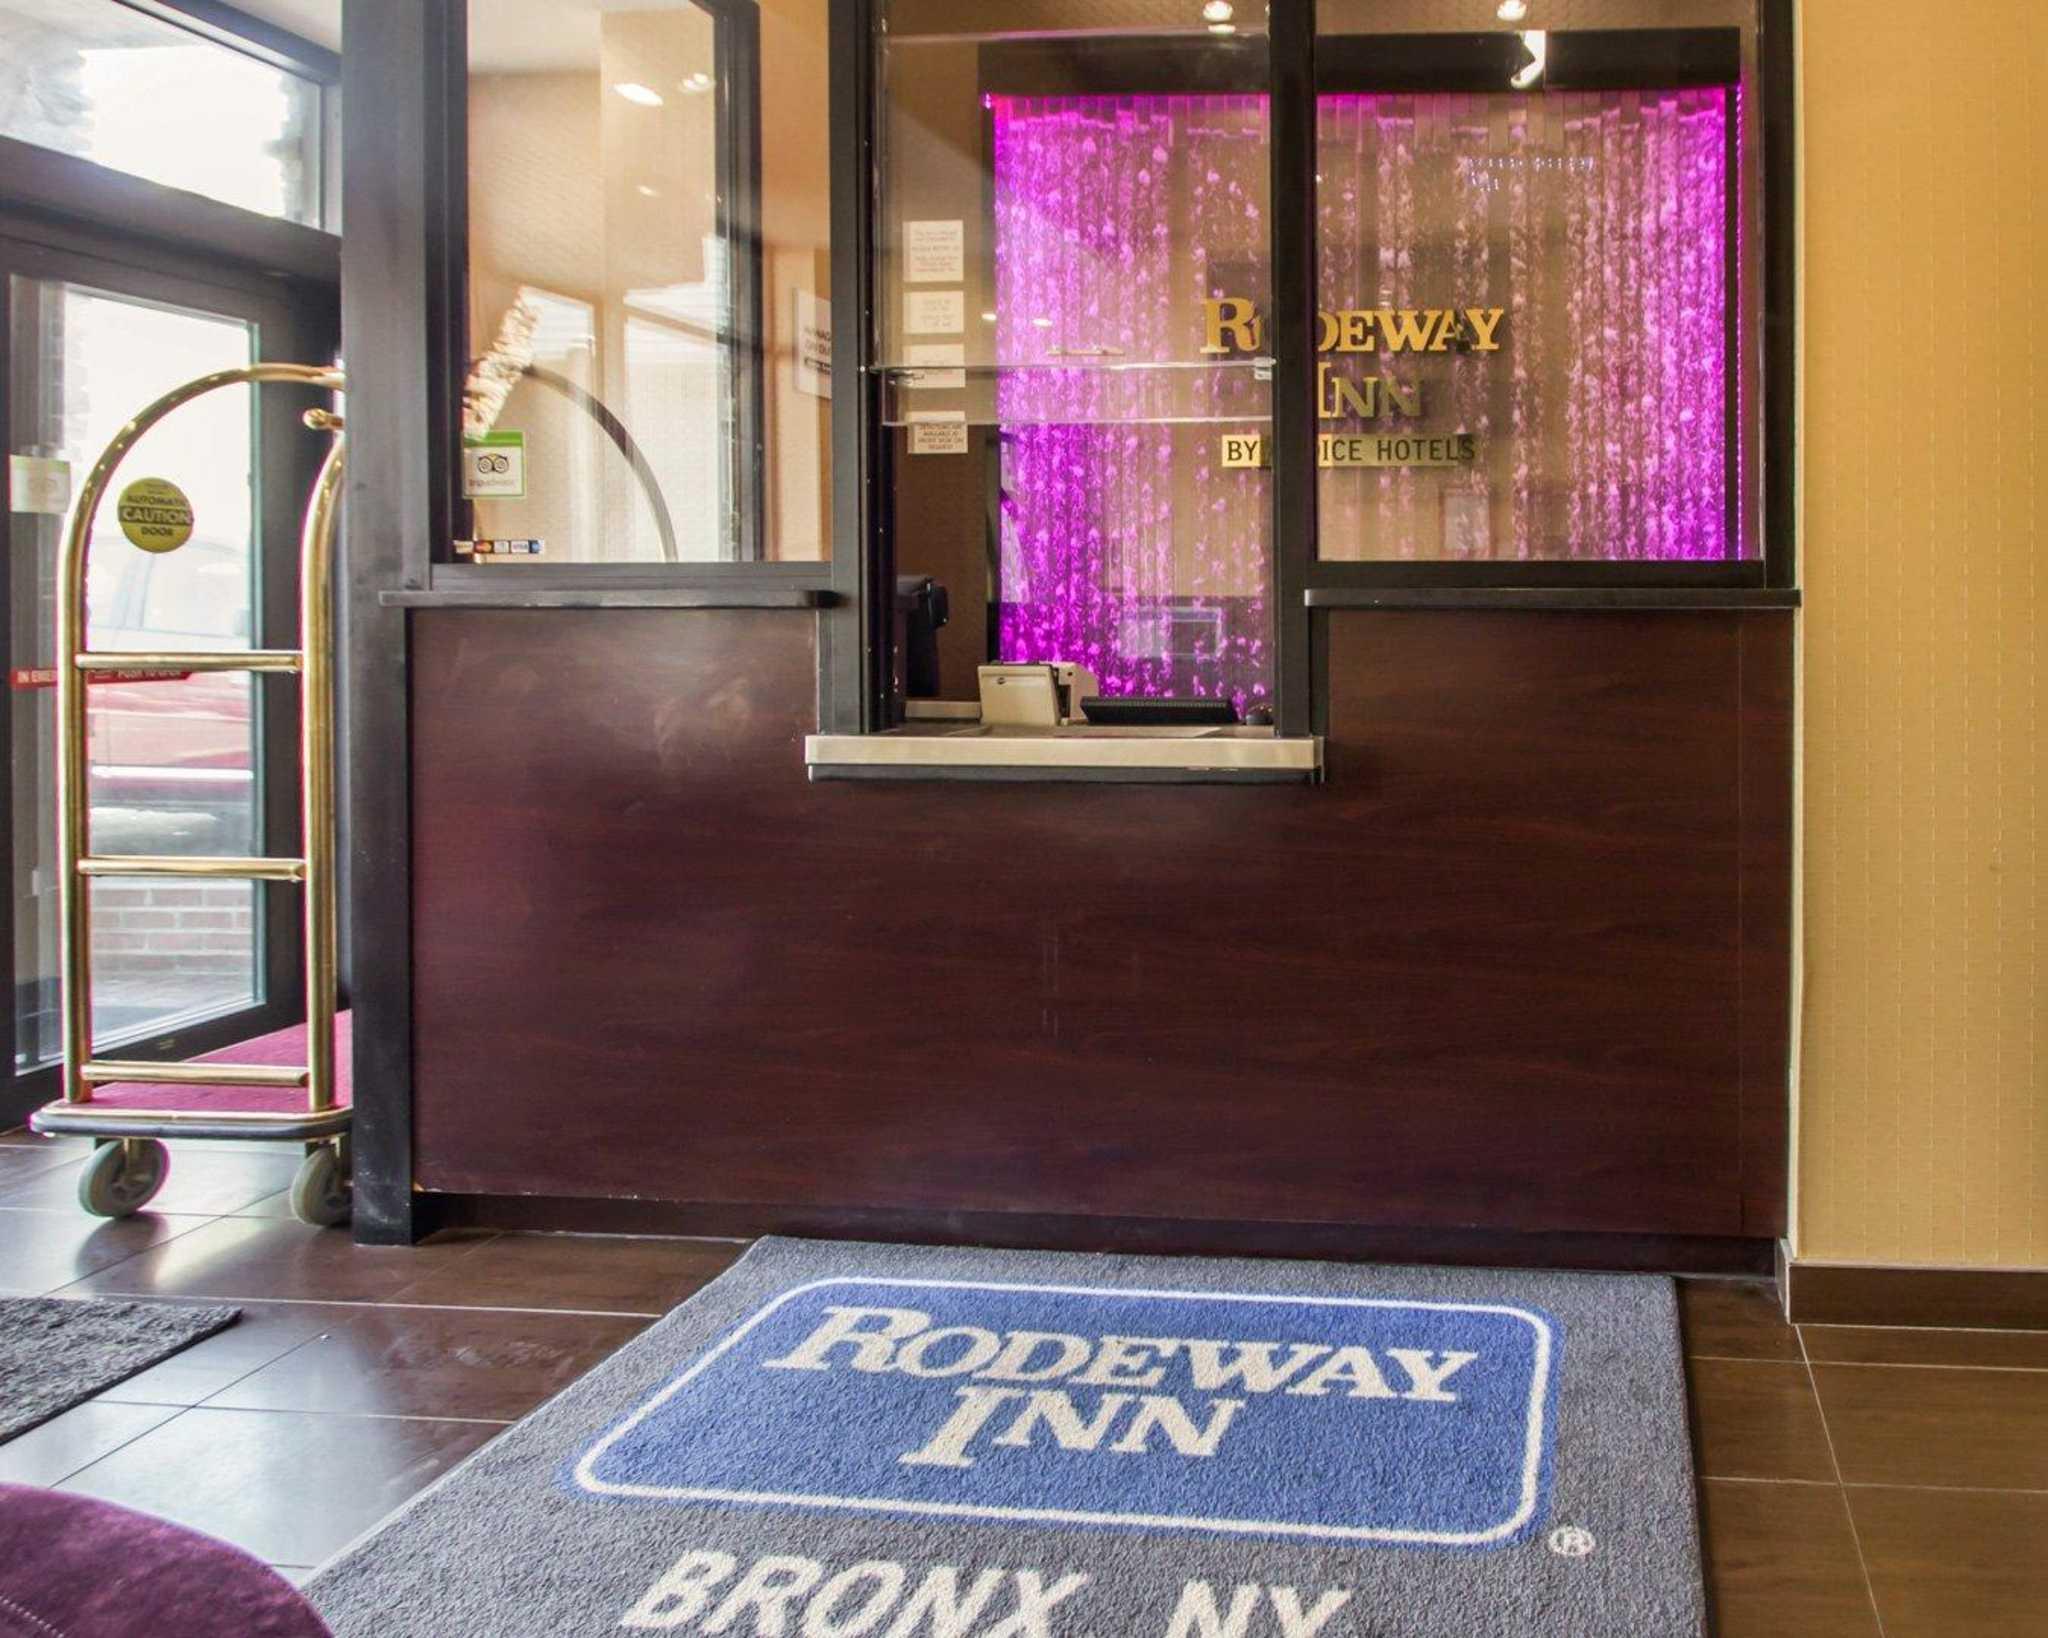 Rodeway Inn Bronx Zoo image 11